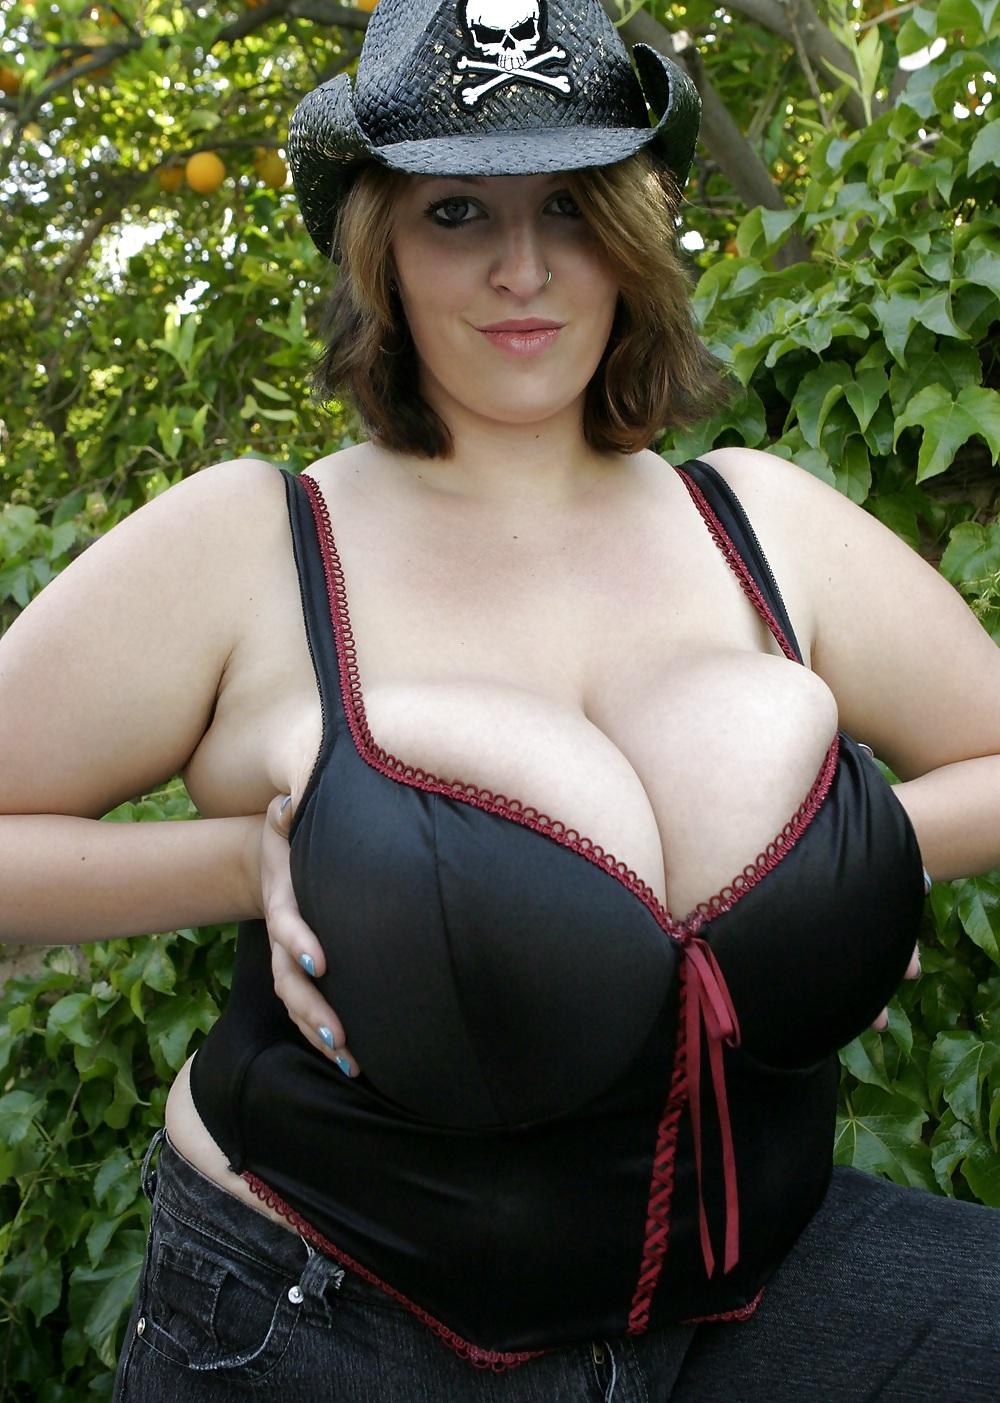 Germany women bigboob, sexiest spanish bikini model nude